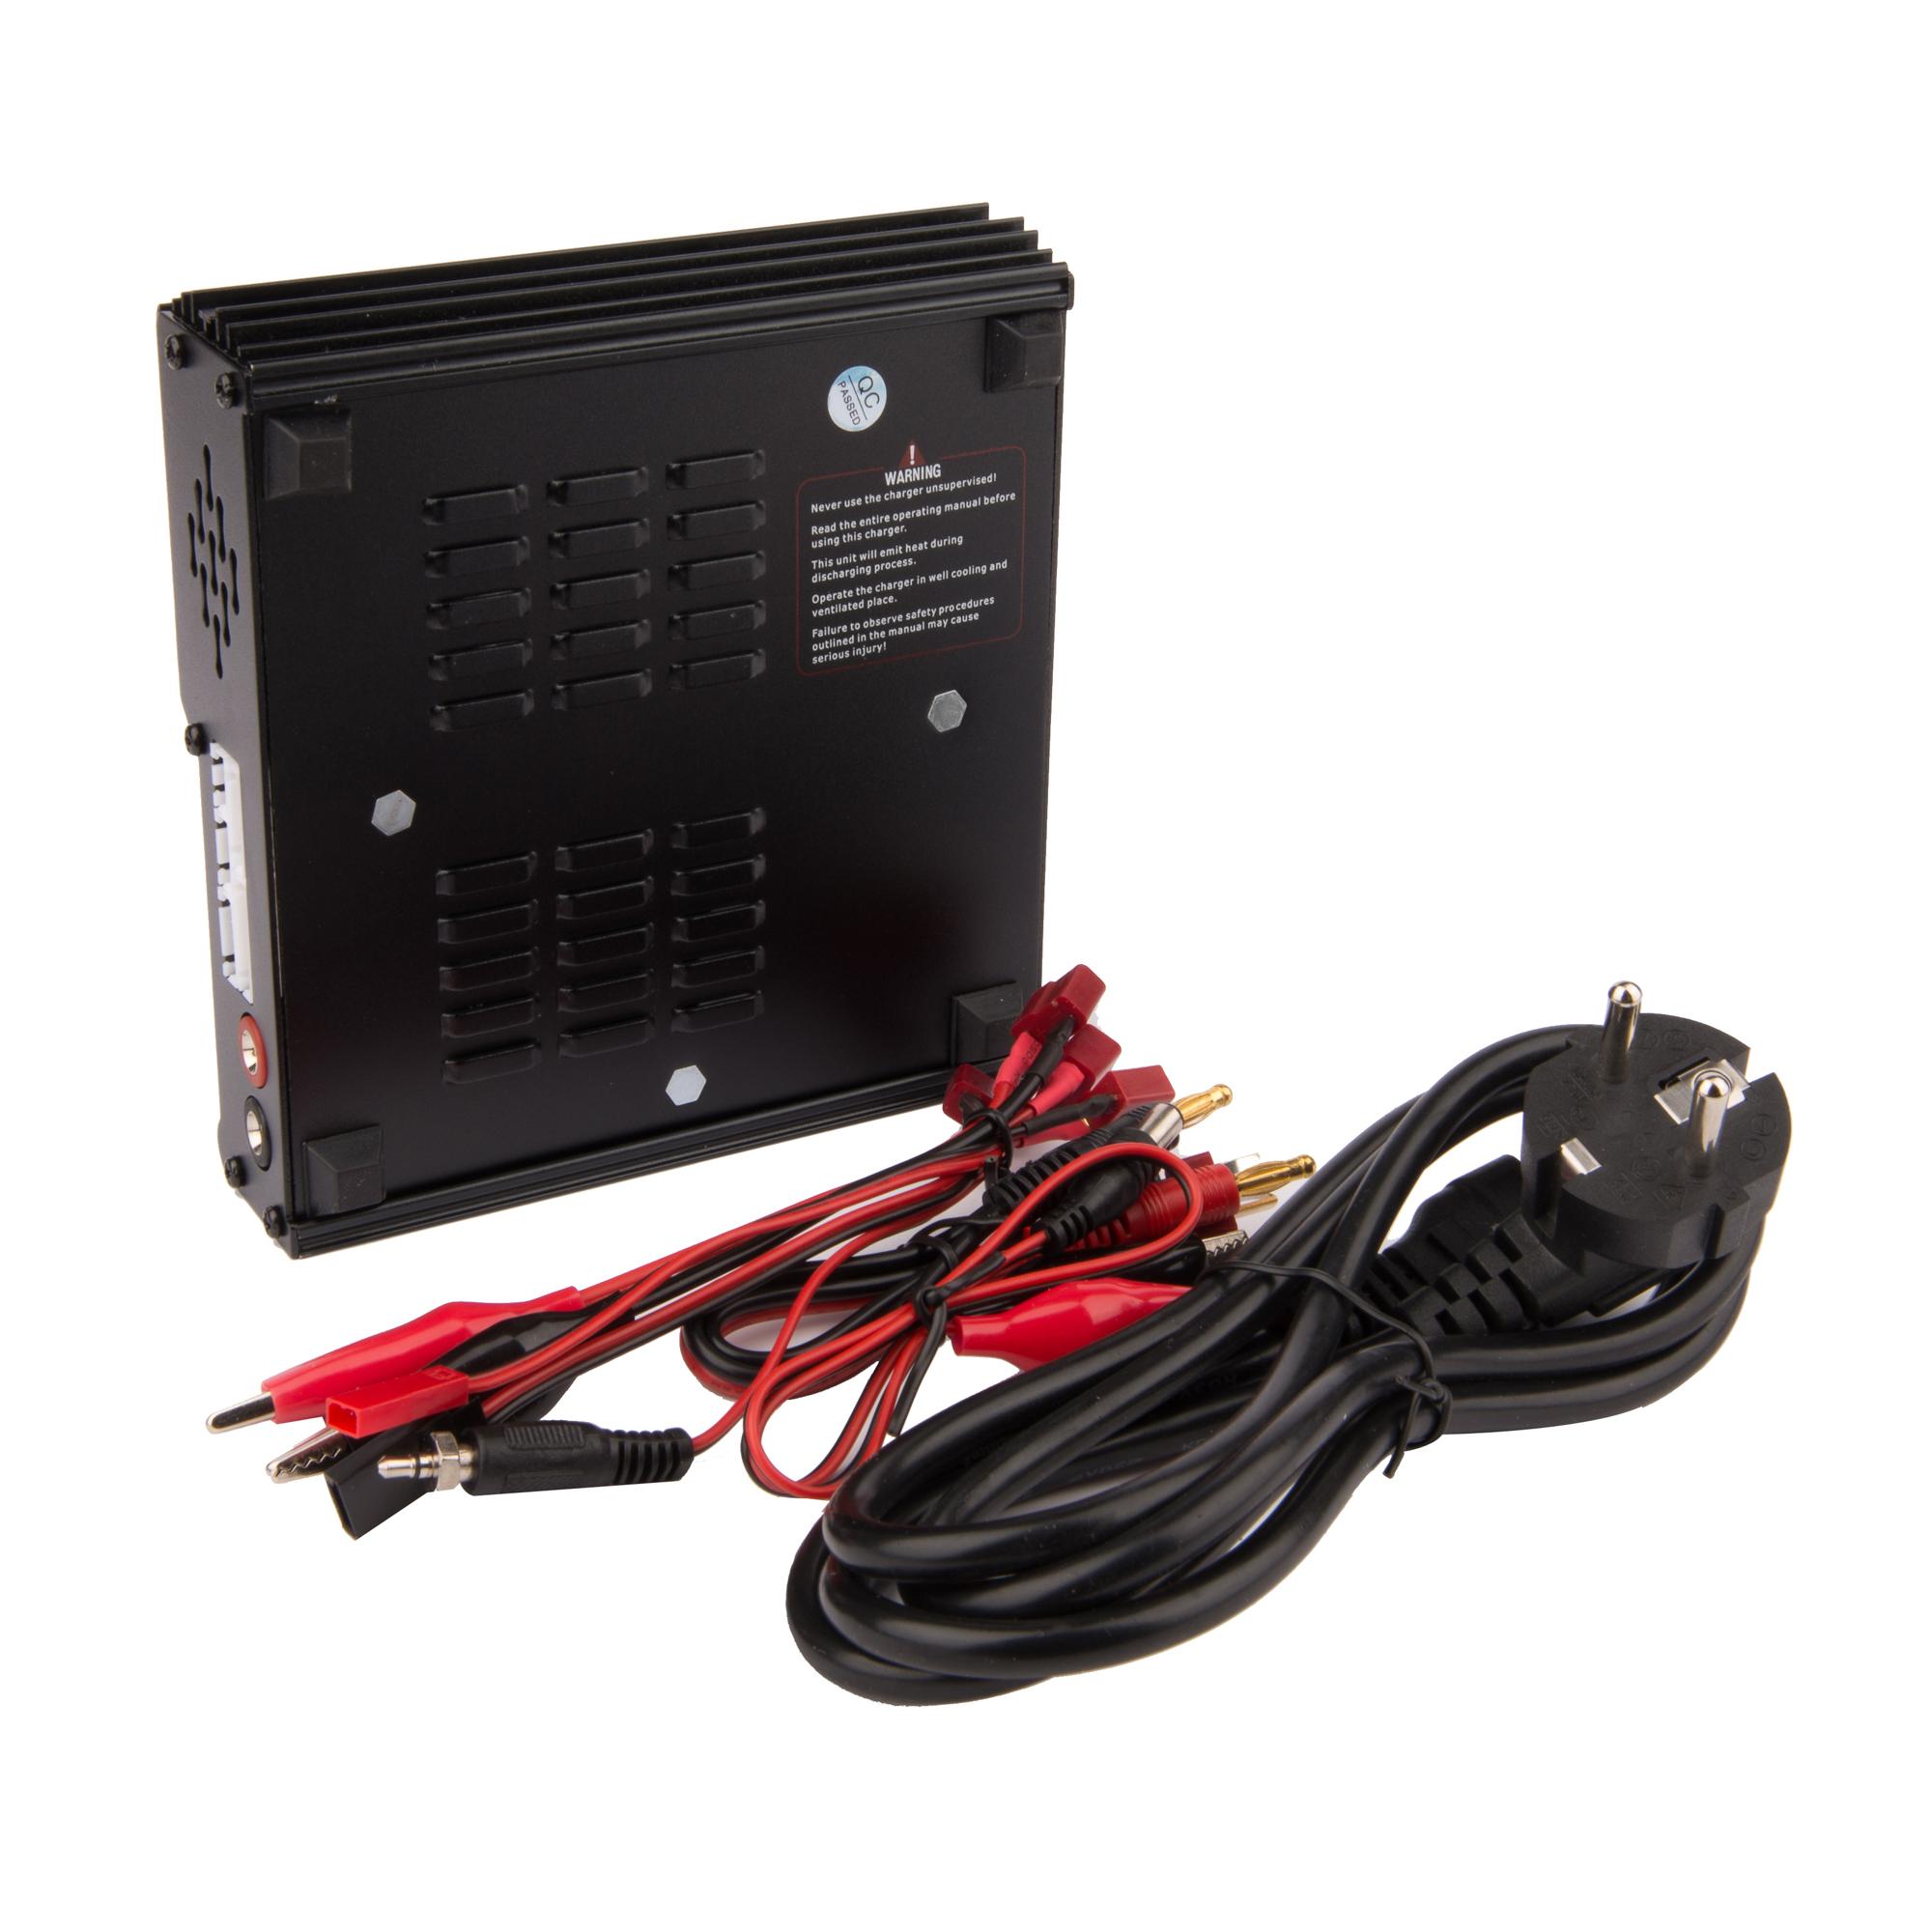 Imax B6AC+ LiPo/Li-Ion/LiFe/NiMH/Nicad/PB RC Battery Balance Charger Dual Power B6 AC Plus YC023-SZ(China (Mainland))